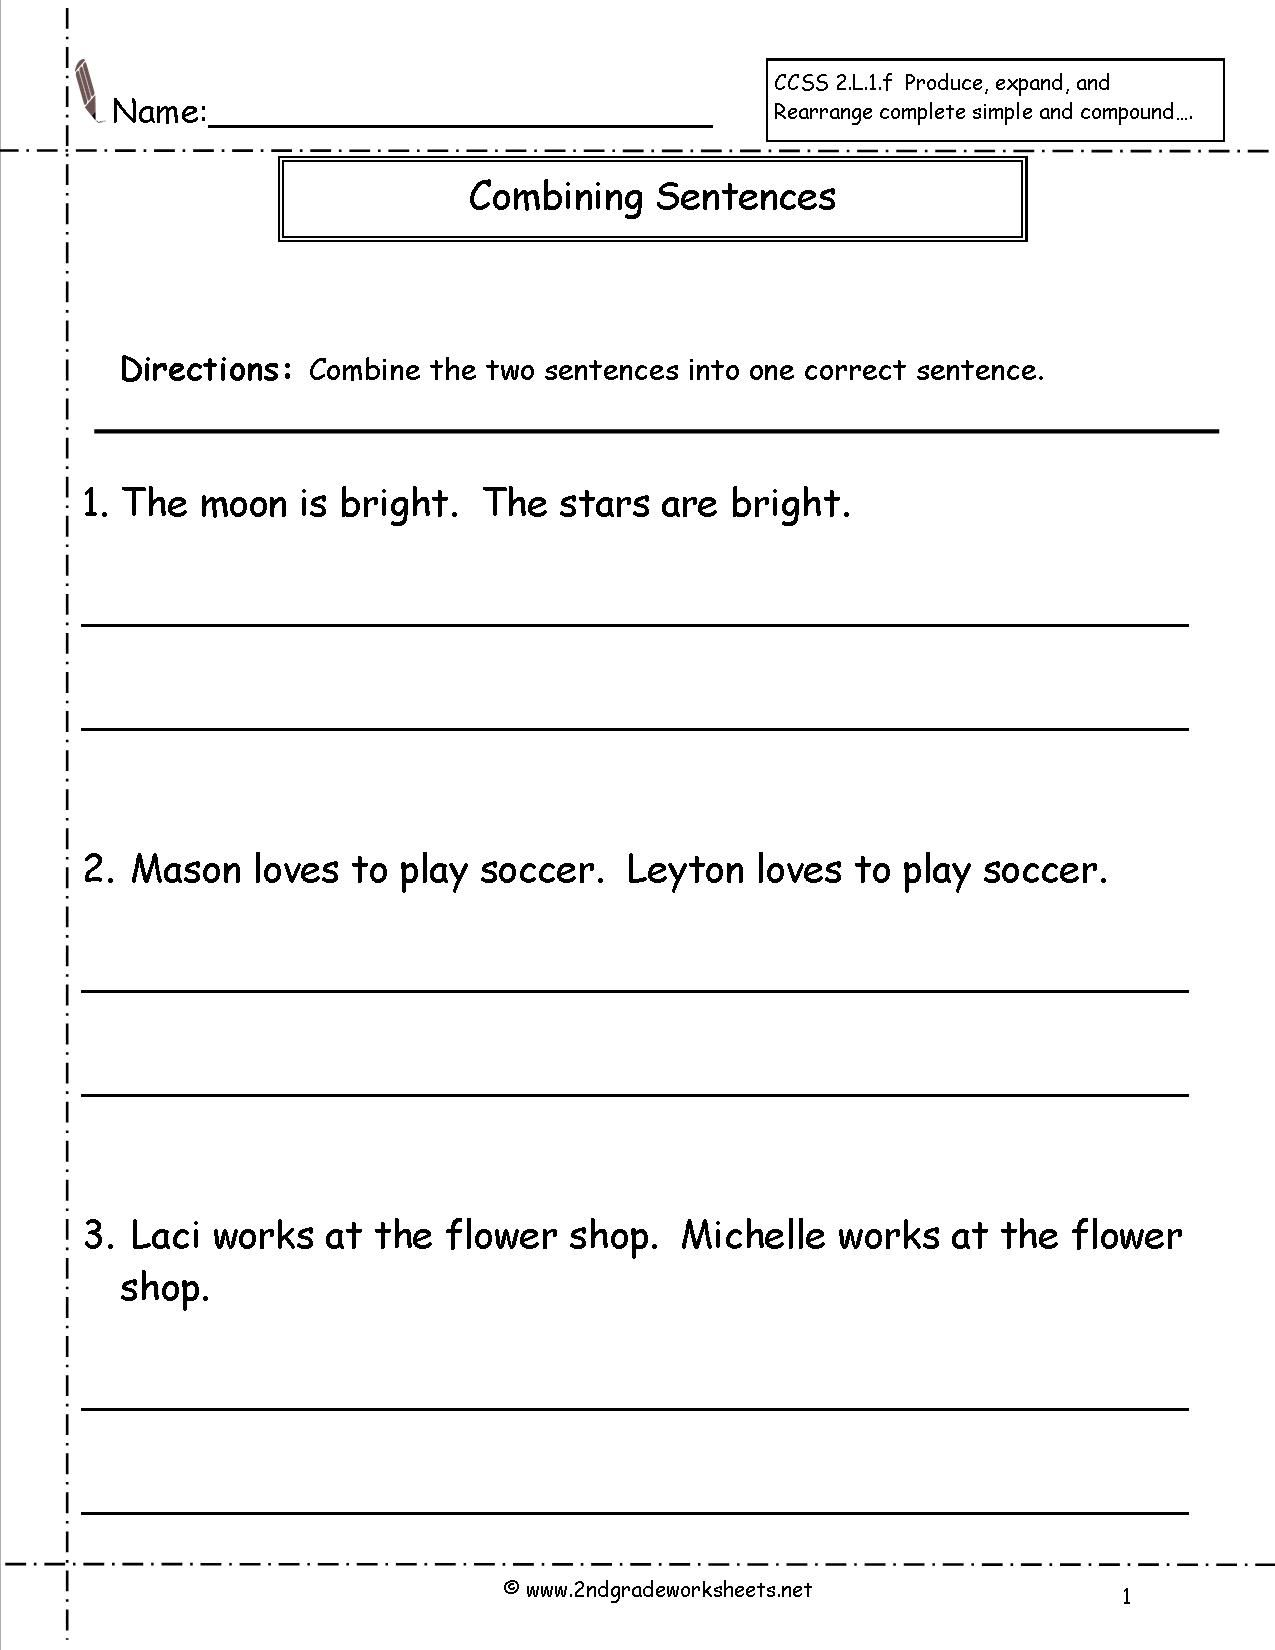 hight resolution of combining sentences worksheet   Combining sentences